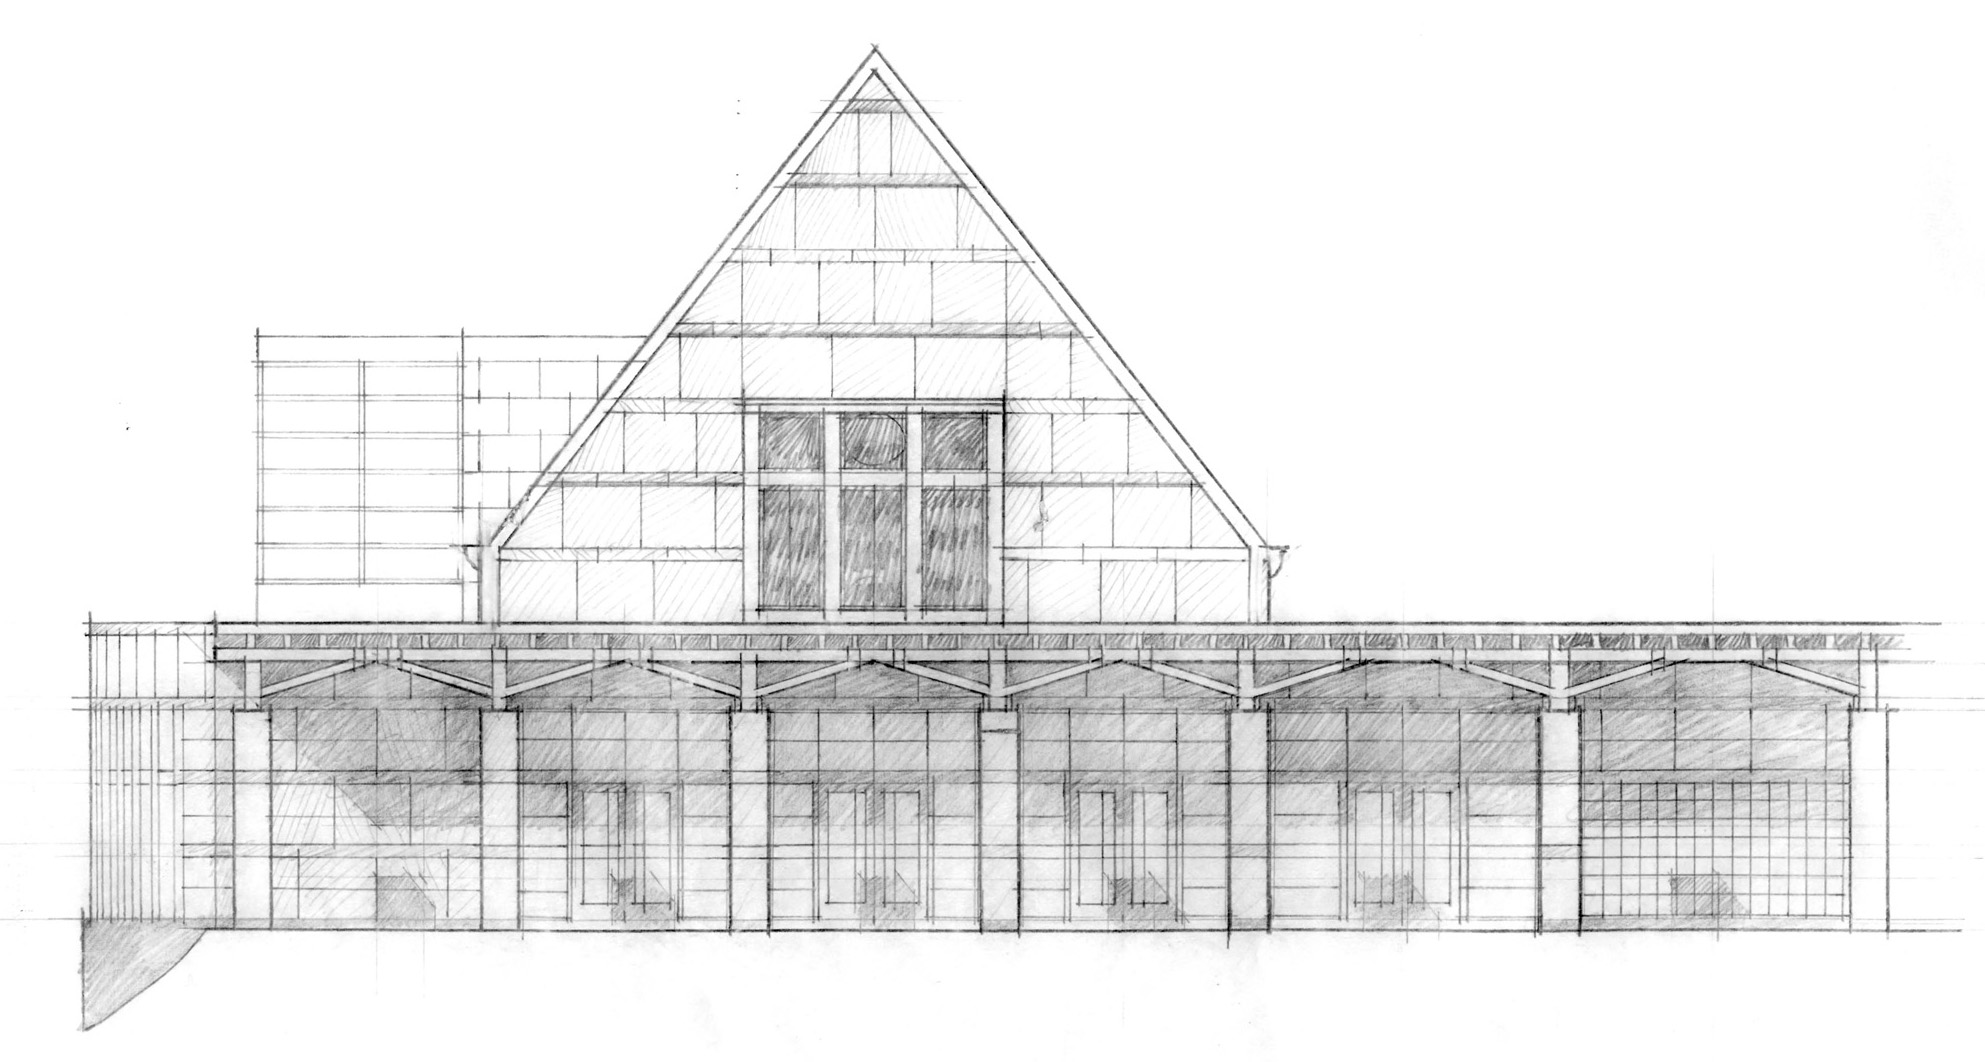 Courtyard Elevation Sketch